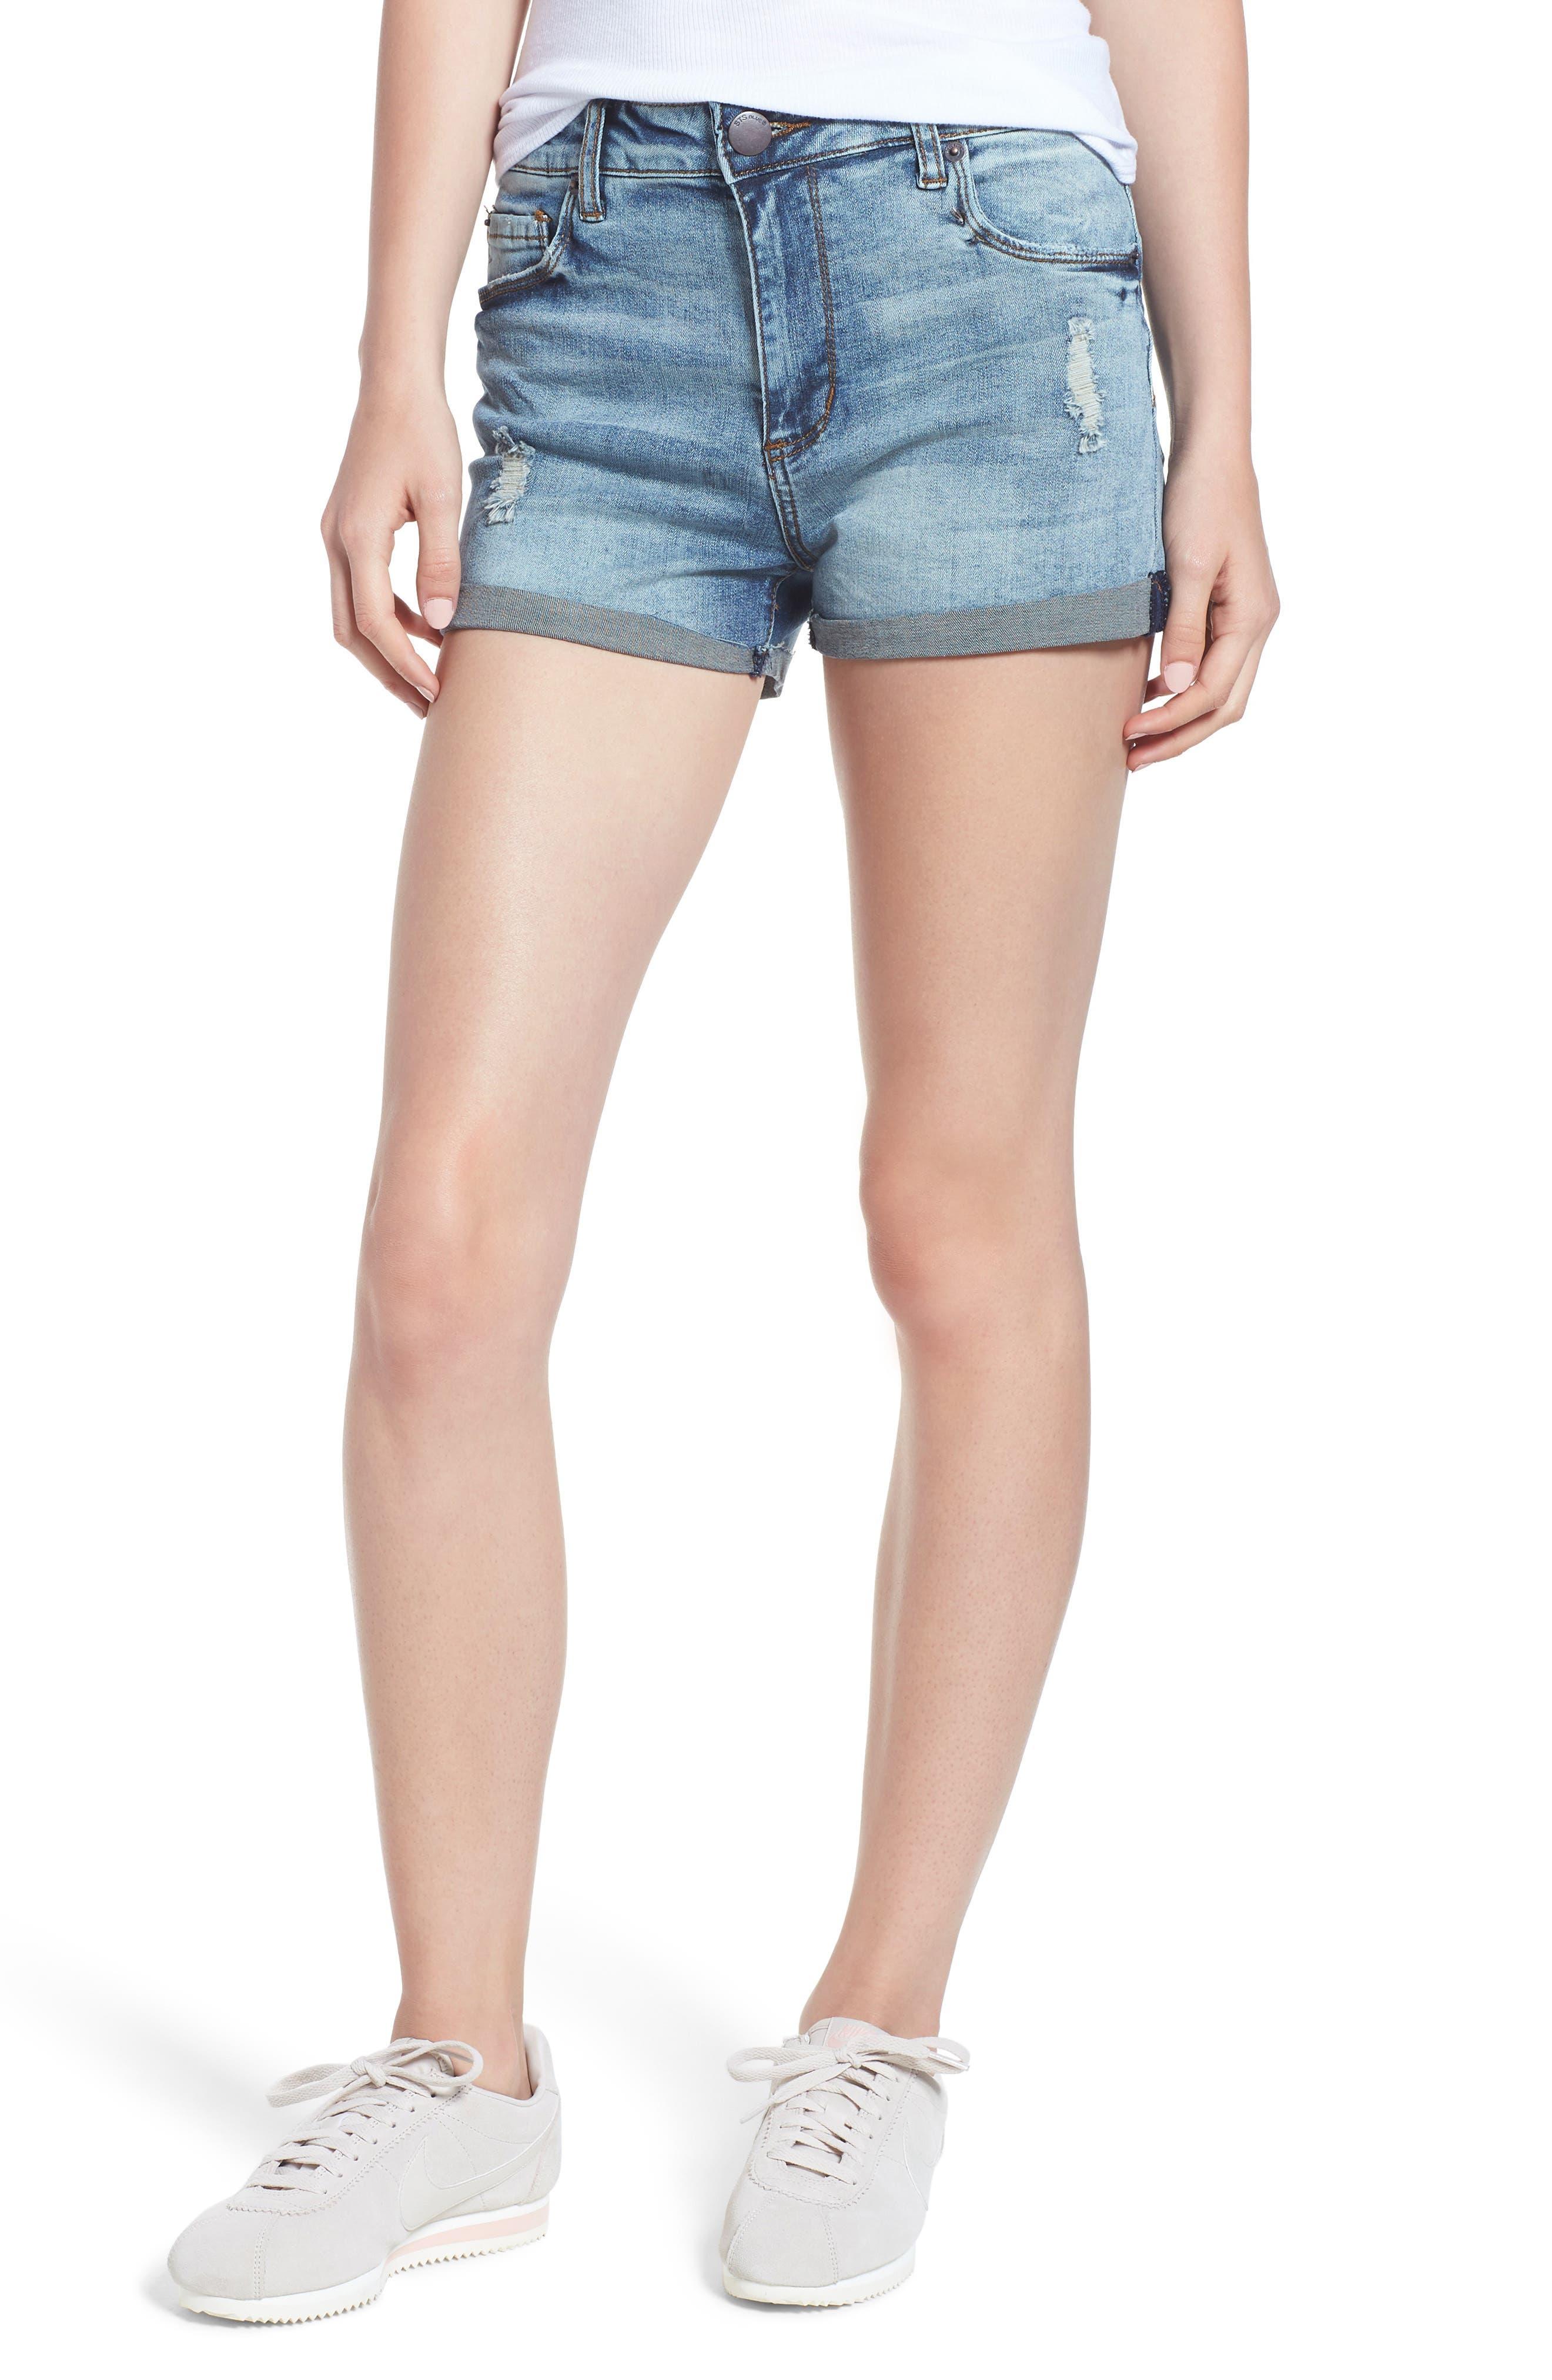 STS Blue Distressed High Waist Denim Shorts,                             Main thumbnail 1, color,                             Rivindel W/ Lt Base